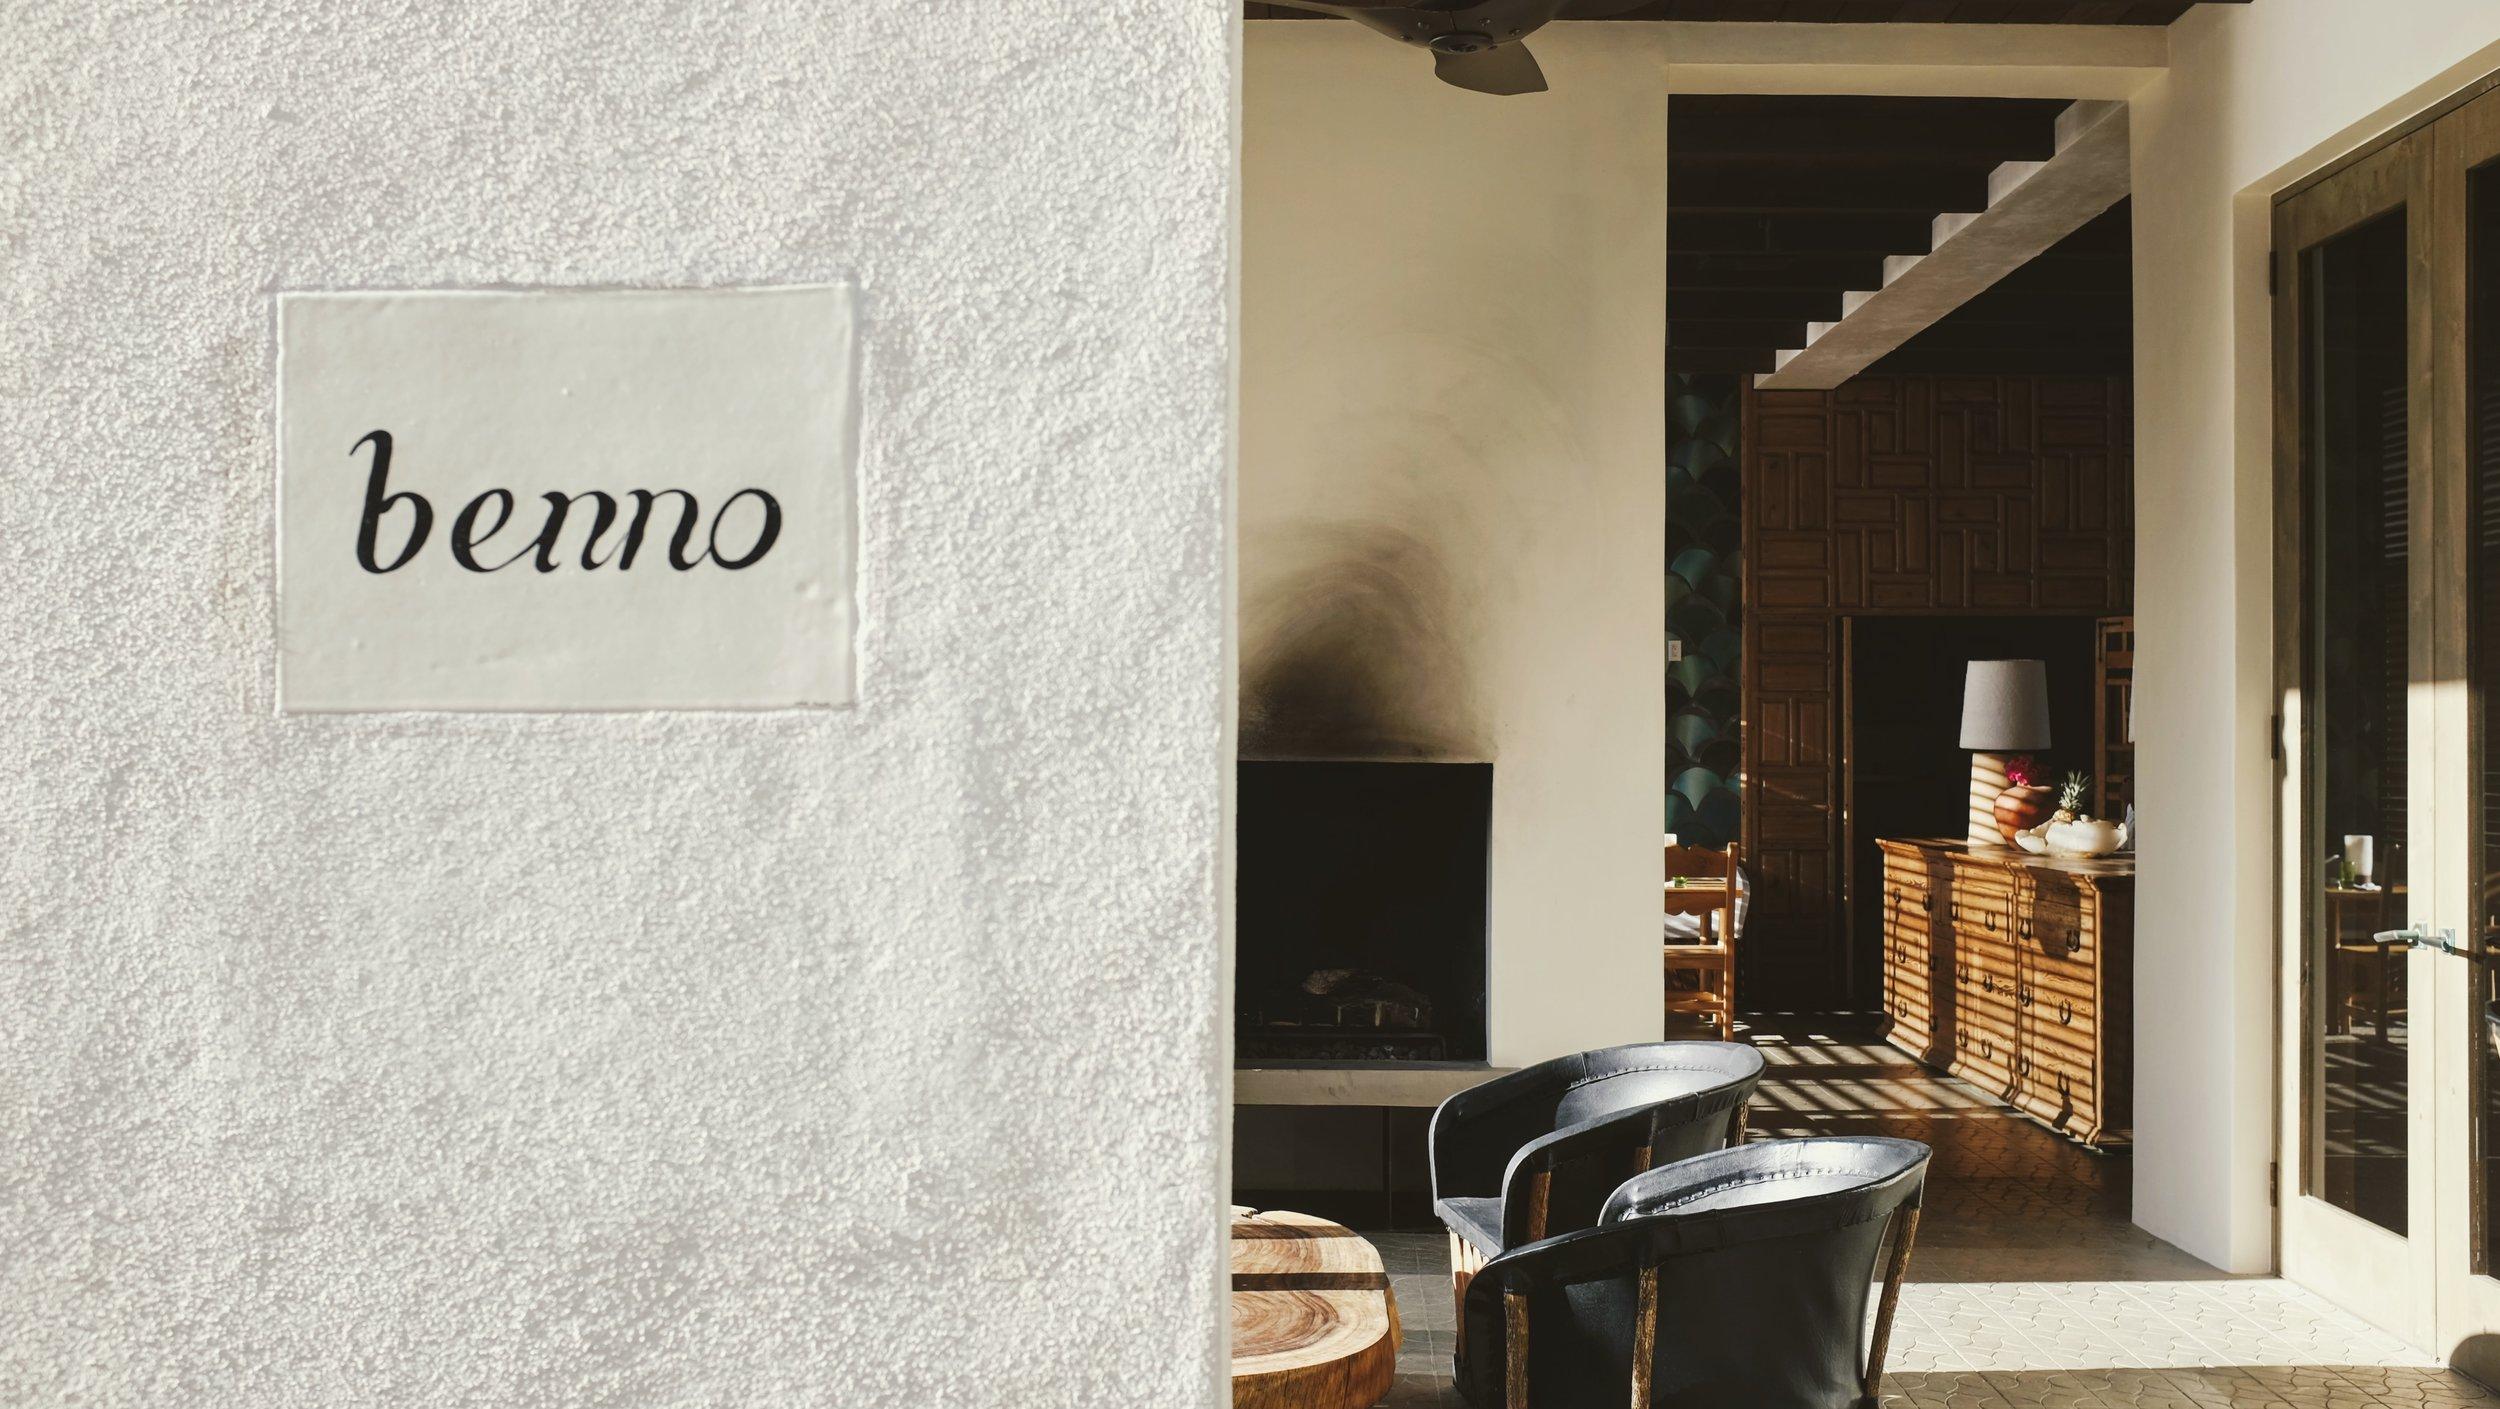 Hotel San Cristobal - Benno 3.jpg